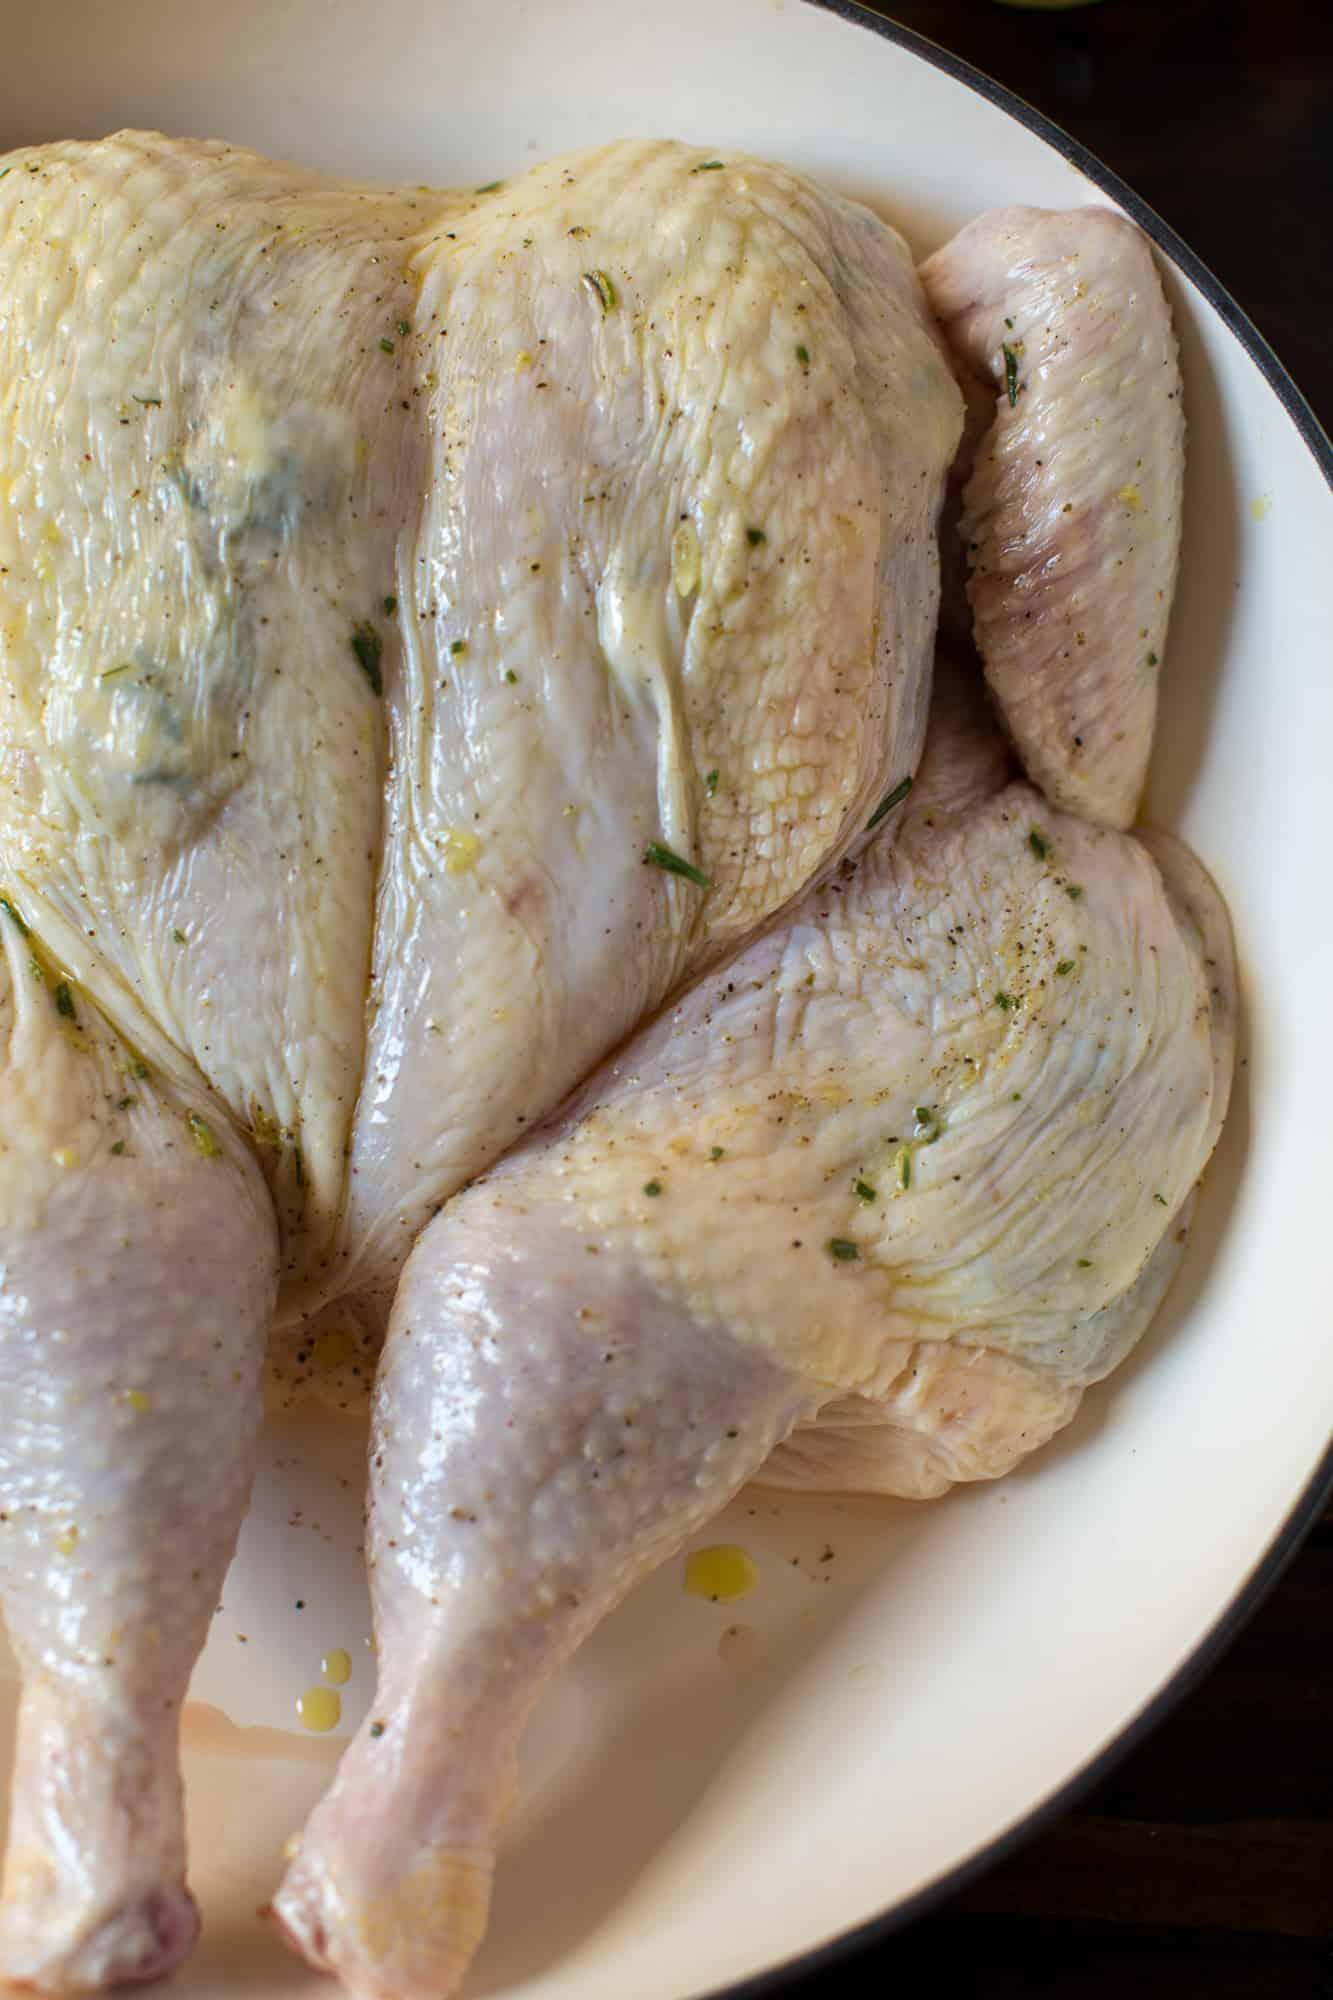 Whole raw chicken seasoned in a pan